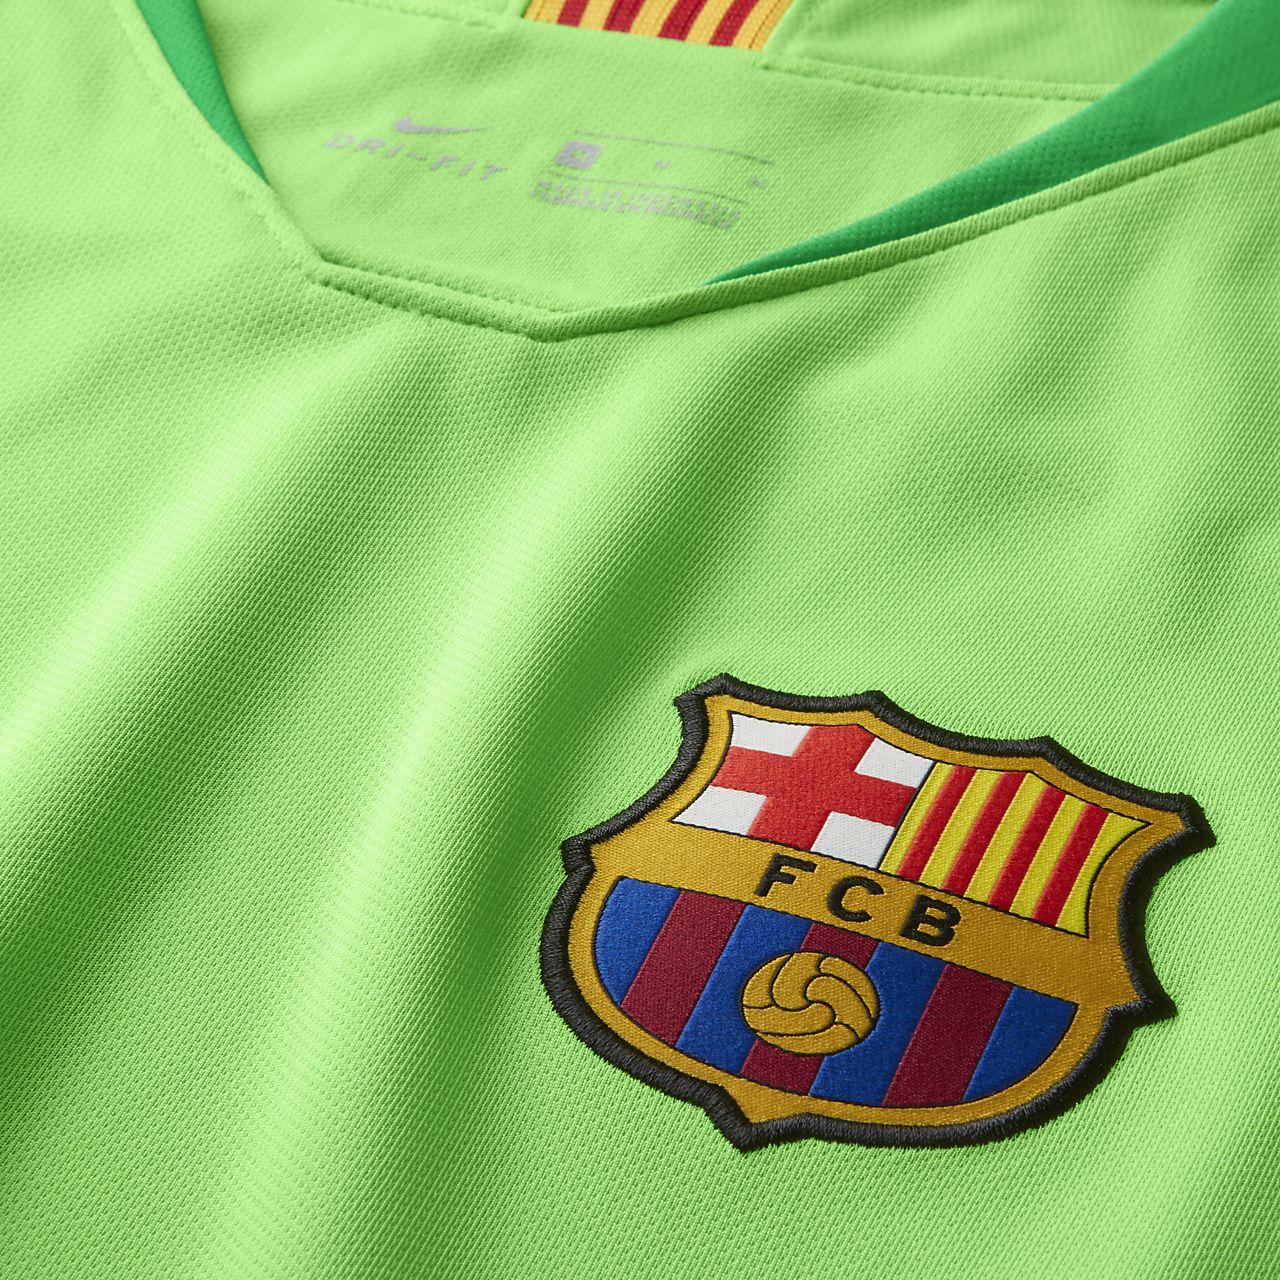 77cc9dde7 2018 19 FC Barcelona Stadium Goalkeeper Men s Football Shirt. Nike ...